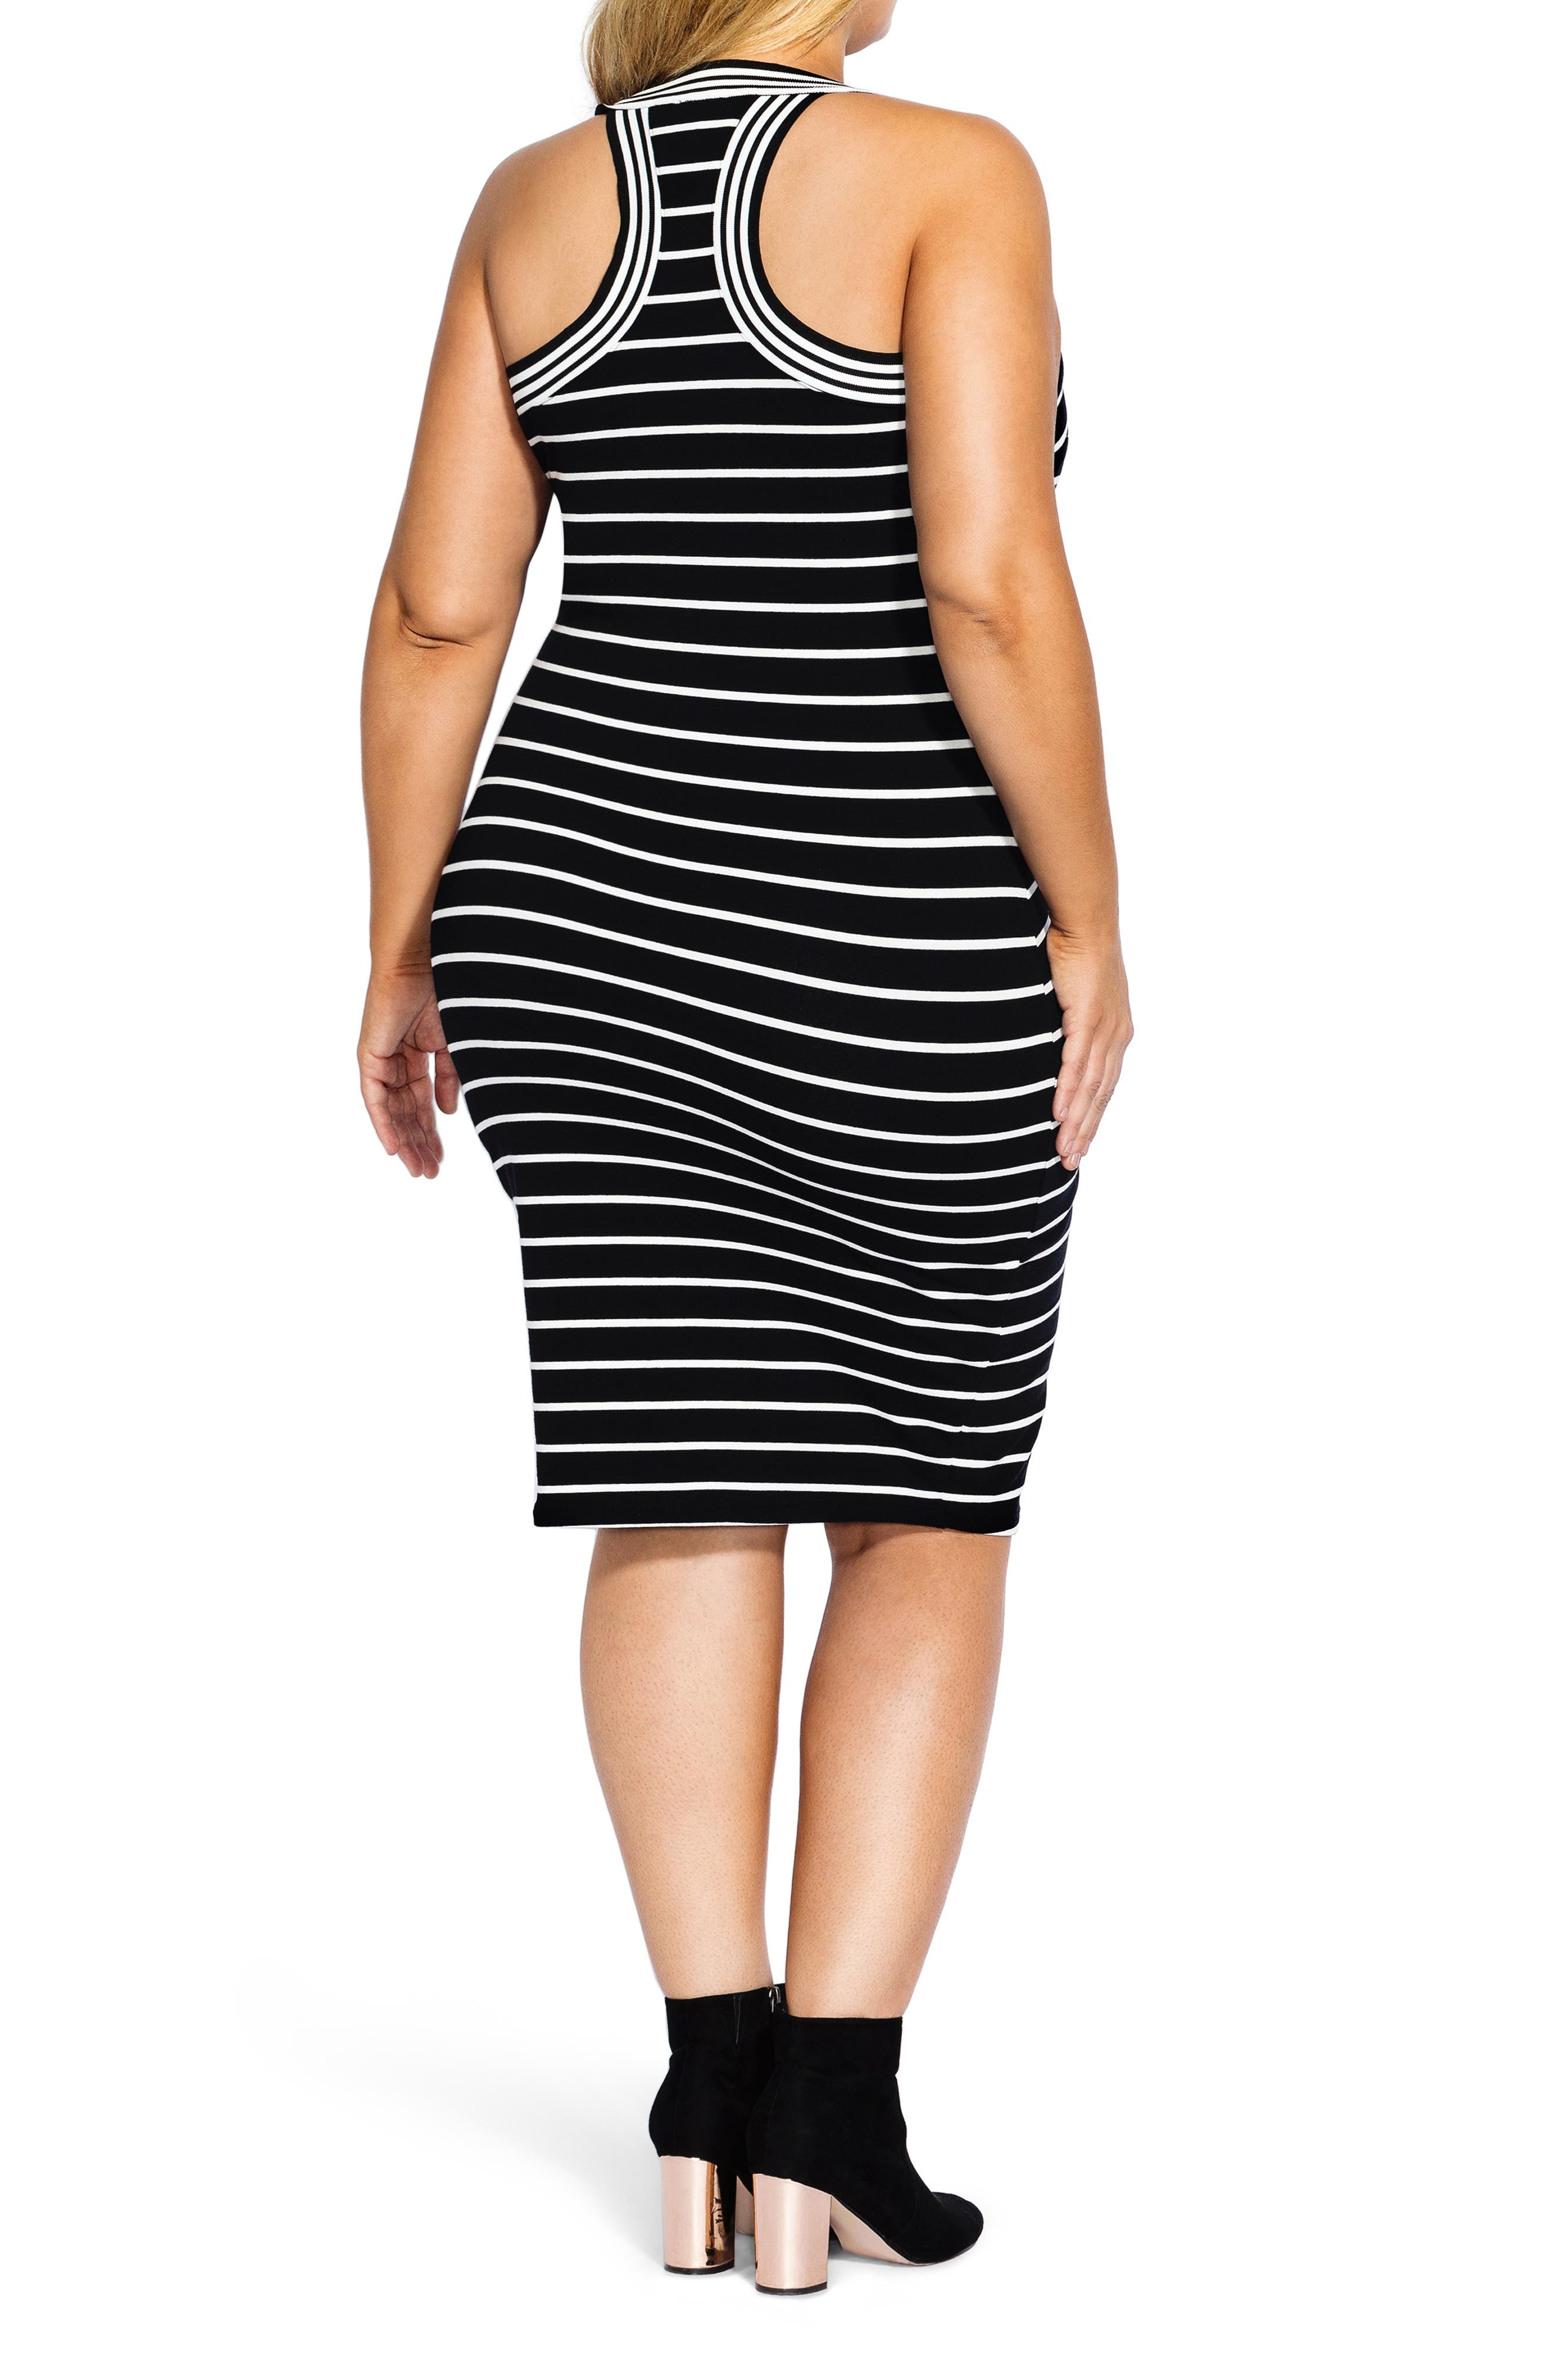 CITY CHIC, Stripe Racerback Dress, Alternate thumbnail 2, color, WHITE STRIPE